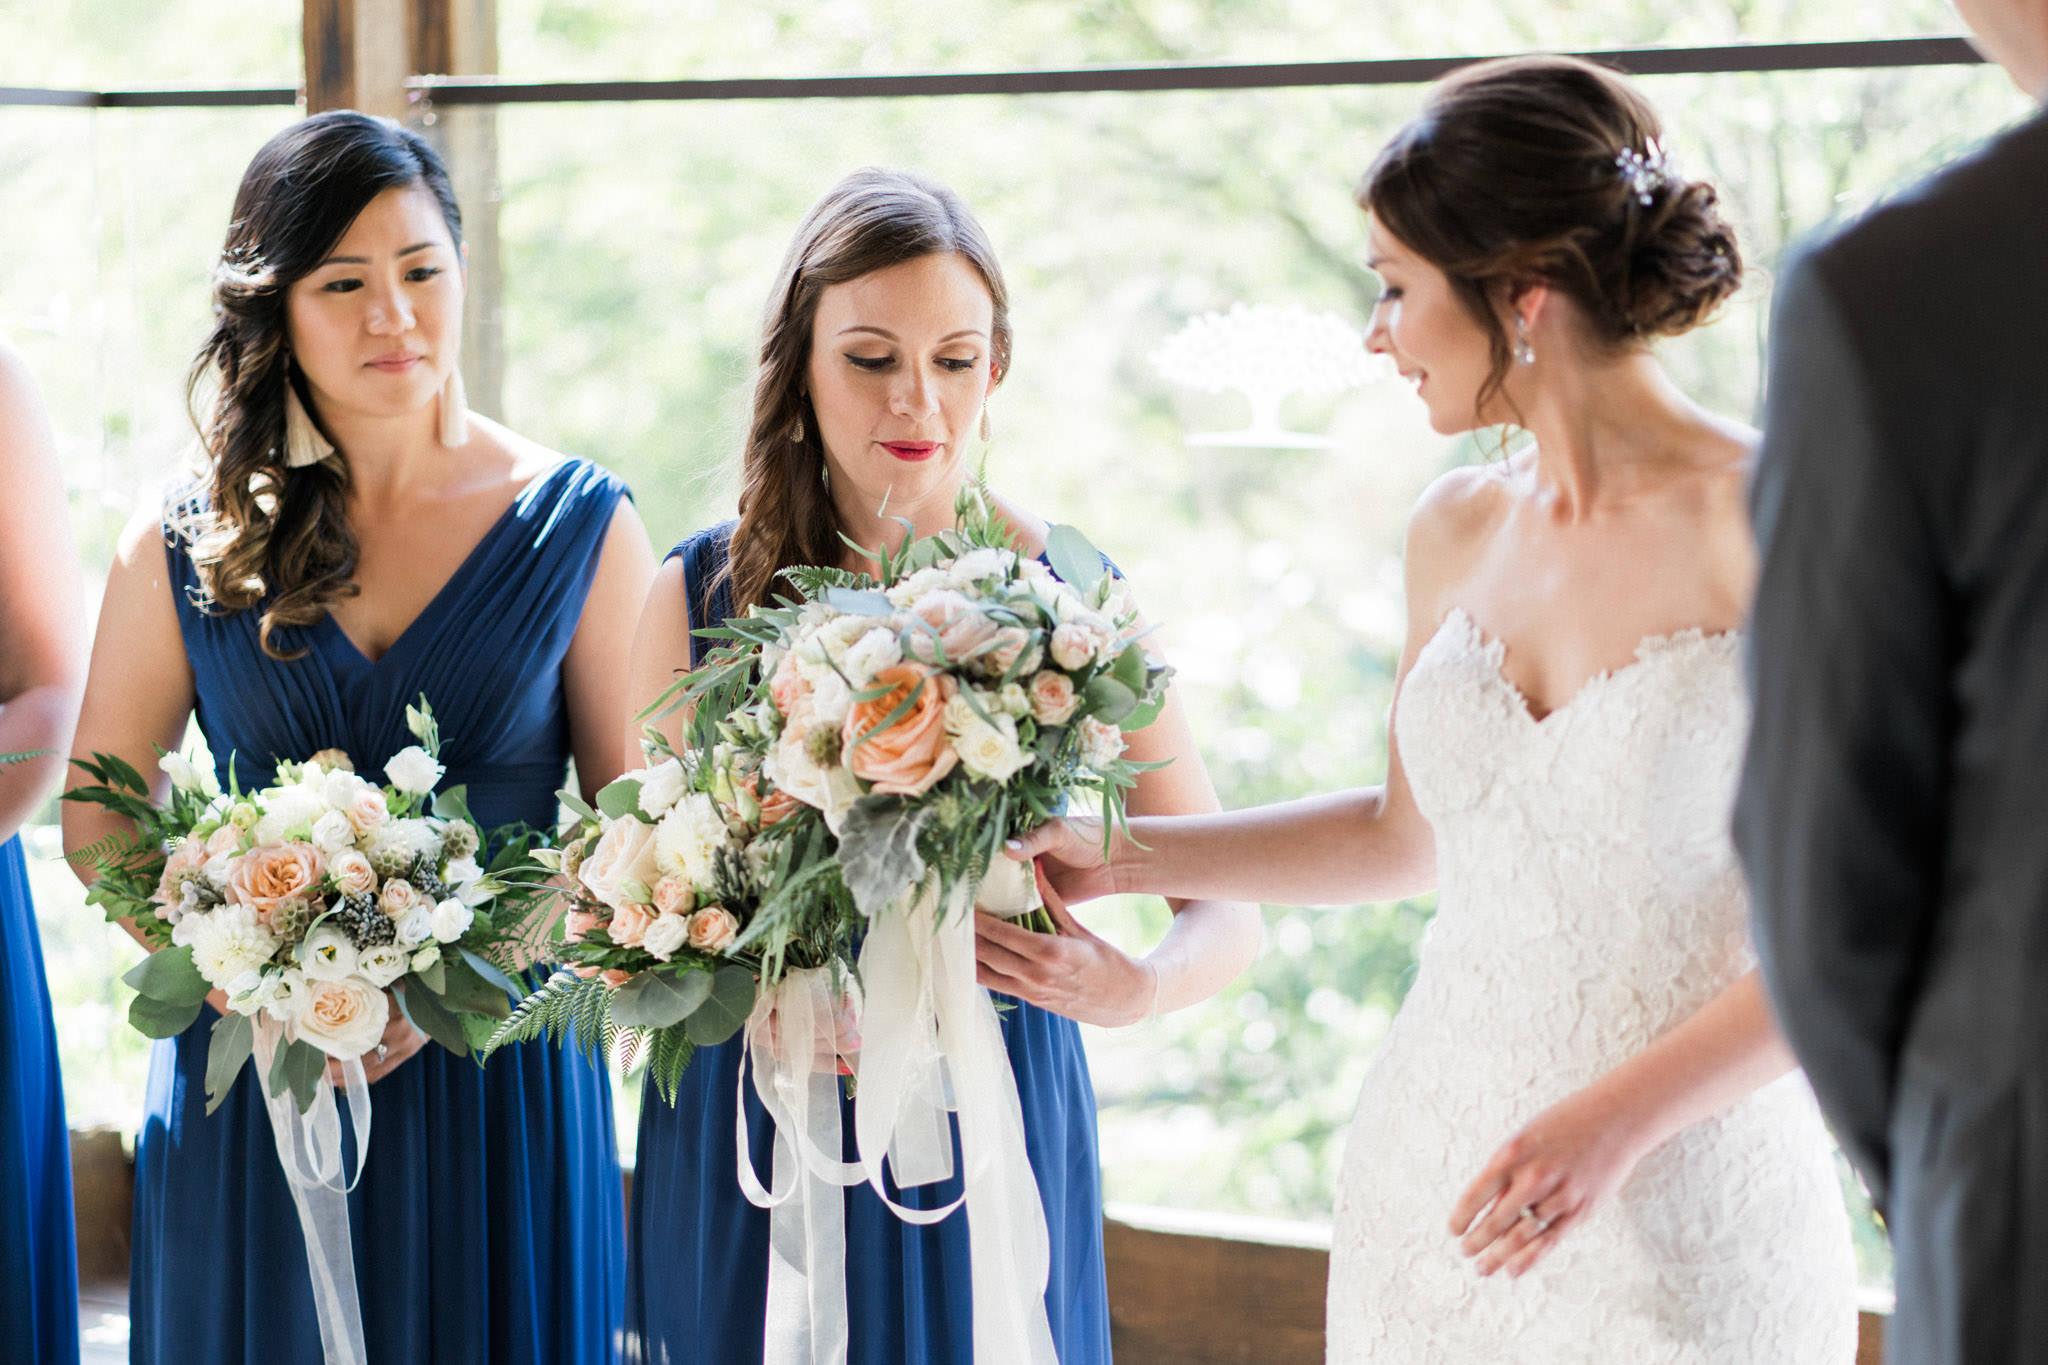 Wedding ceremony at Shaughnessy Restaurant